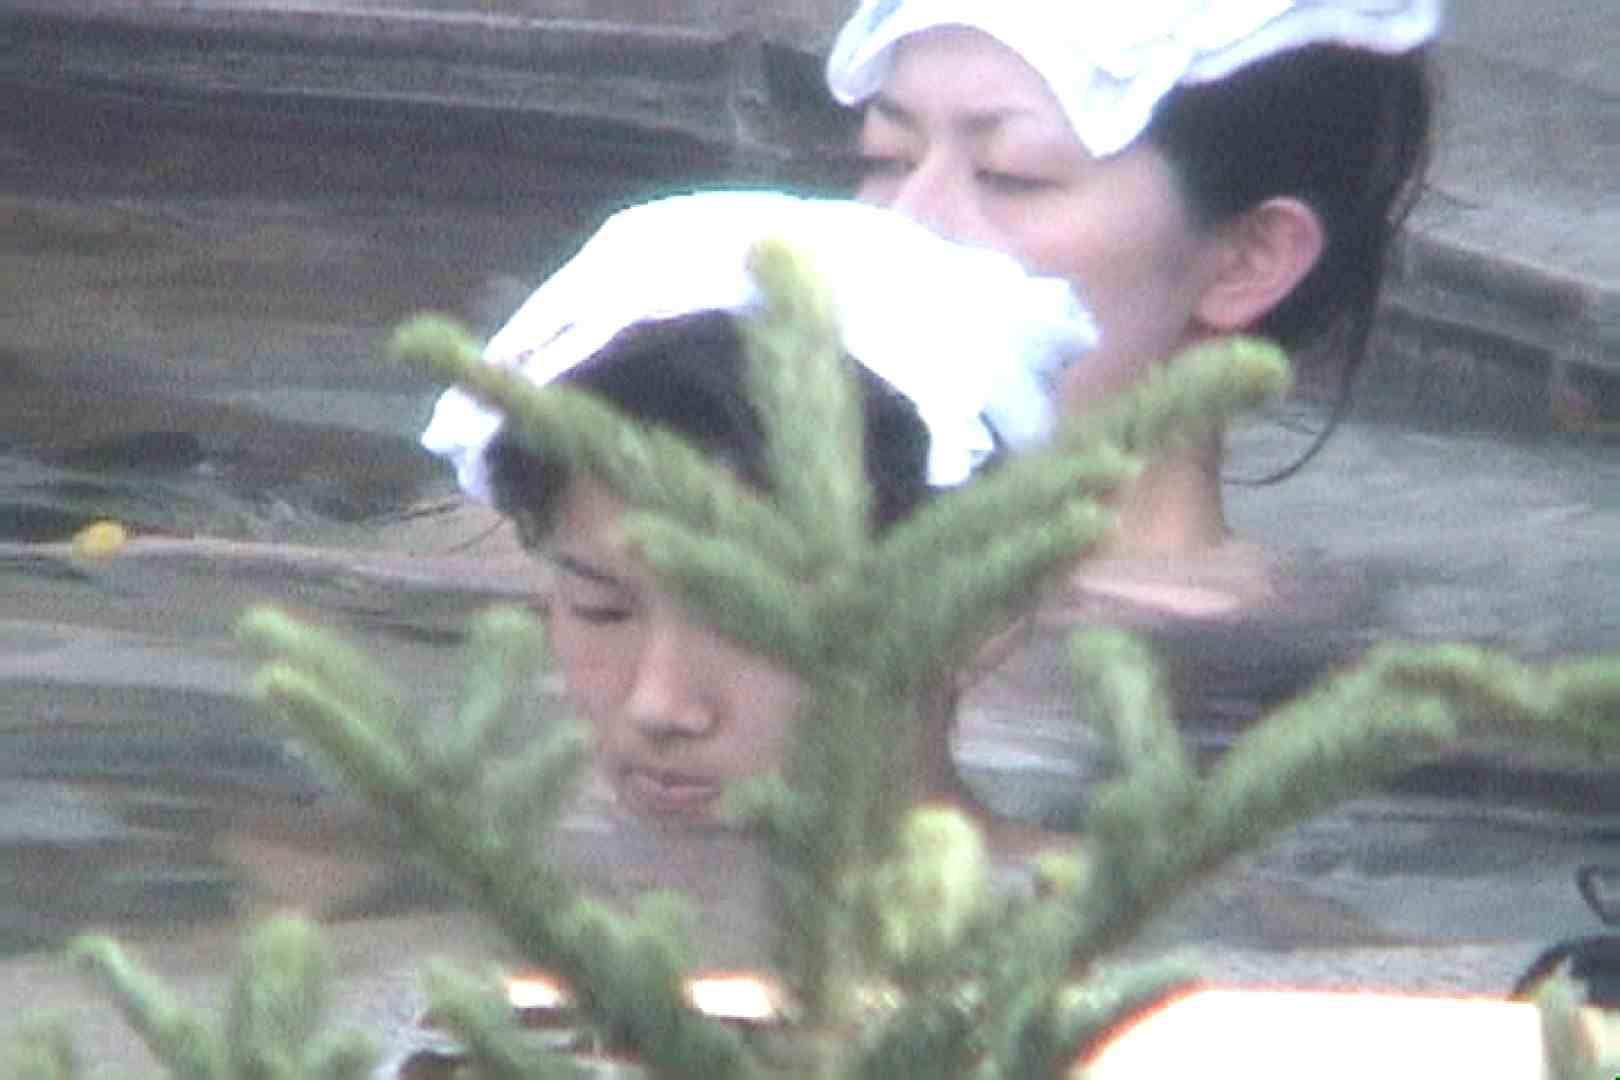 Aquaな露天風呂Vol.80【VIP限定】 露天風呂編   盗撮シリーズ  76PIX 33